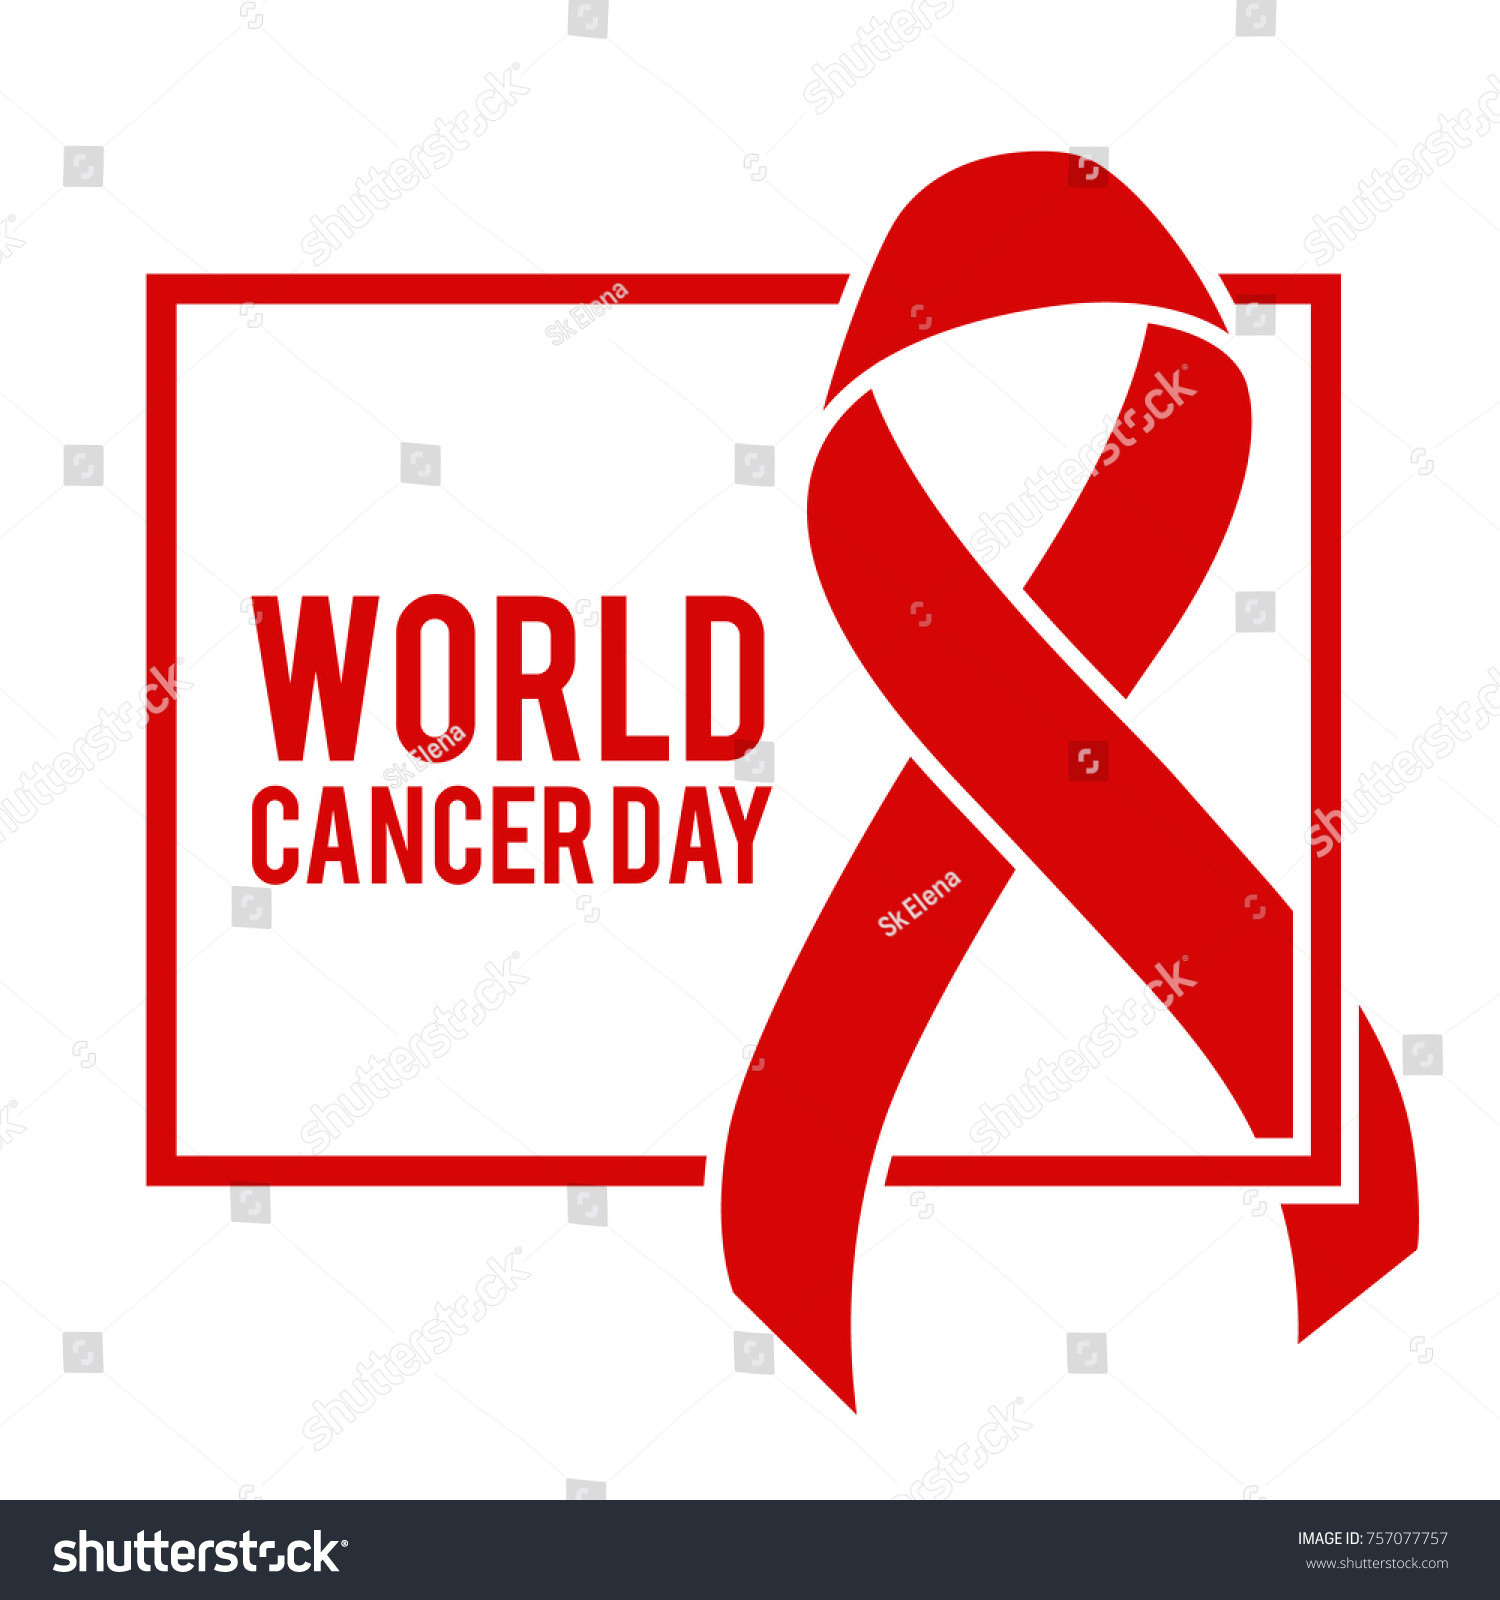 Red Ribbon Symbol Aids Day Awareness Stock Illustration 757077757